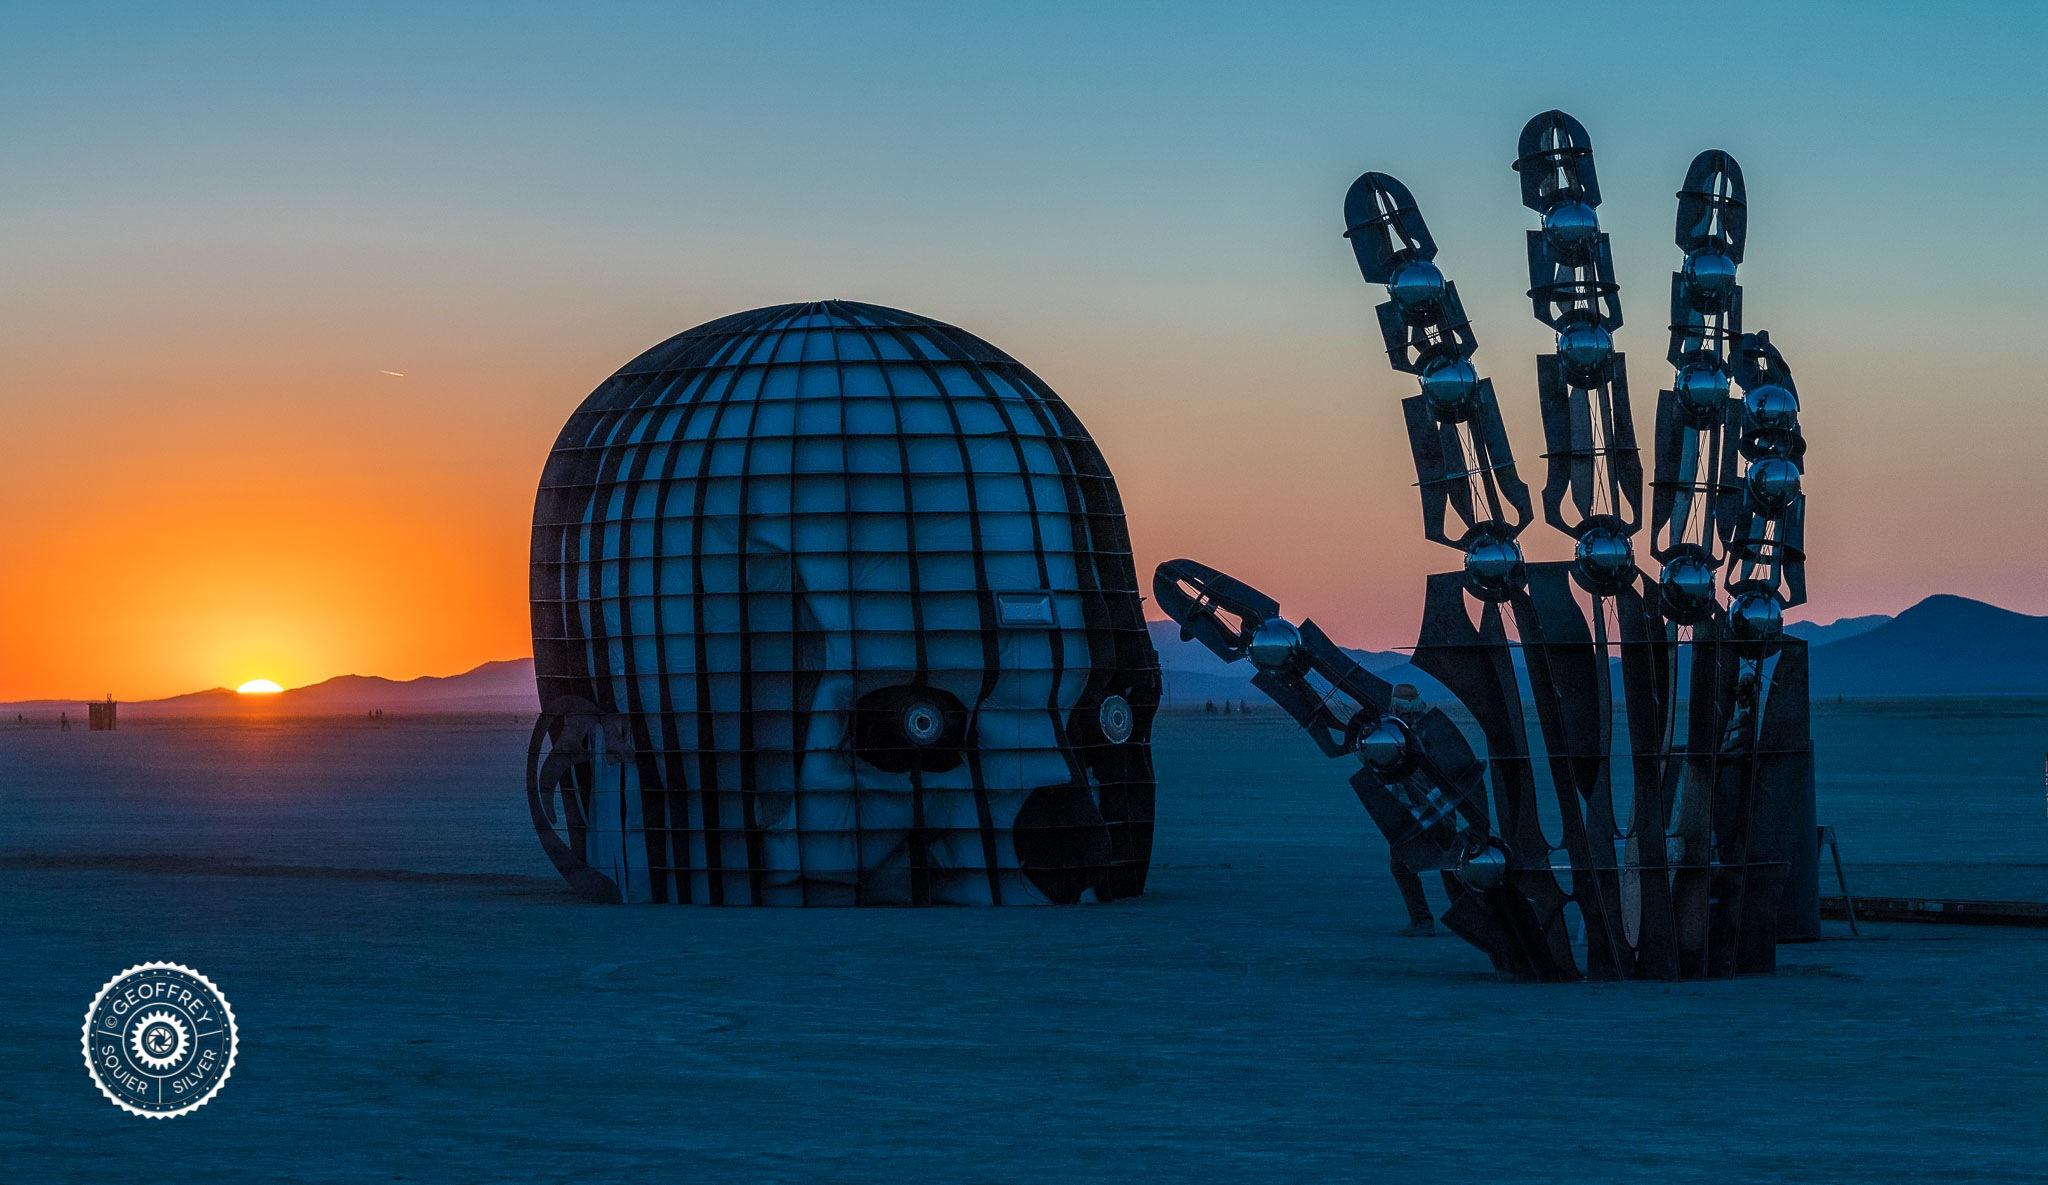 Art at Burning Man  by Geoffrey Squier Silver